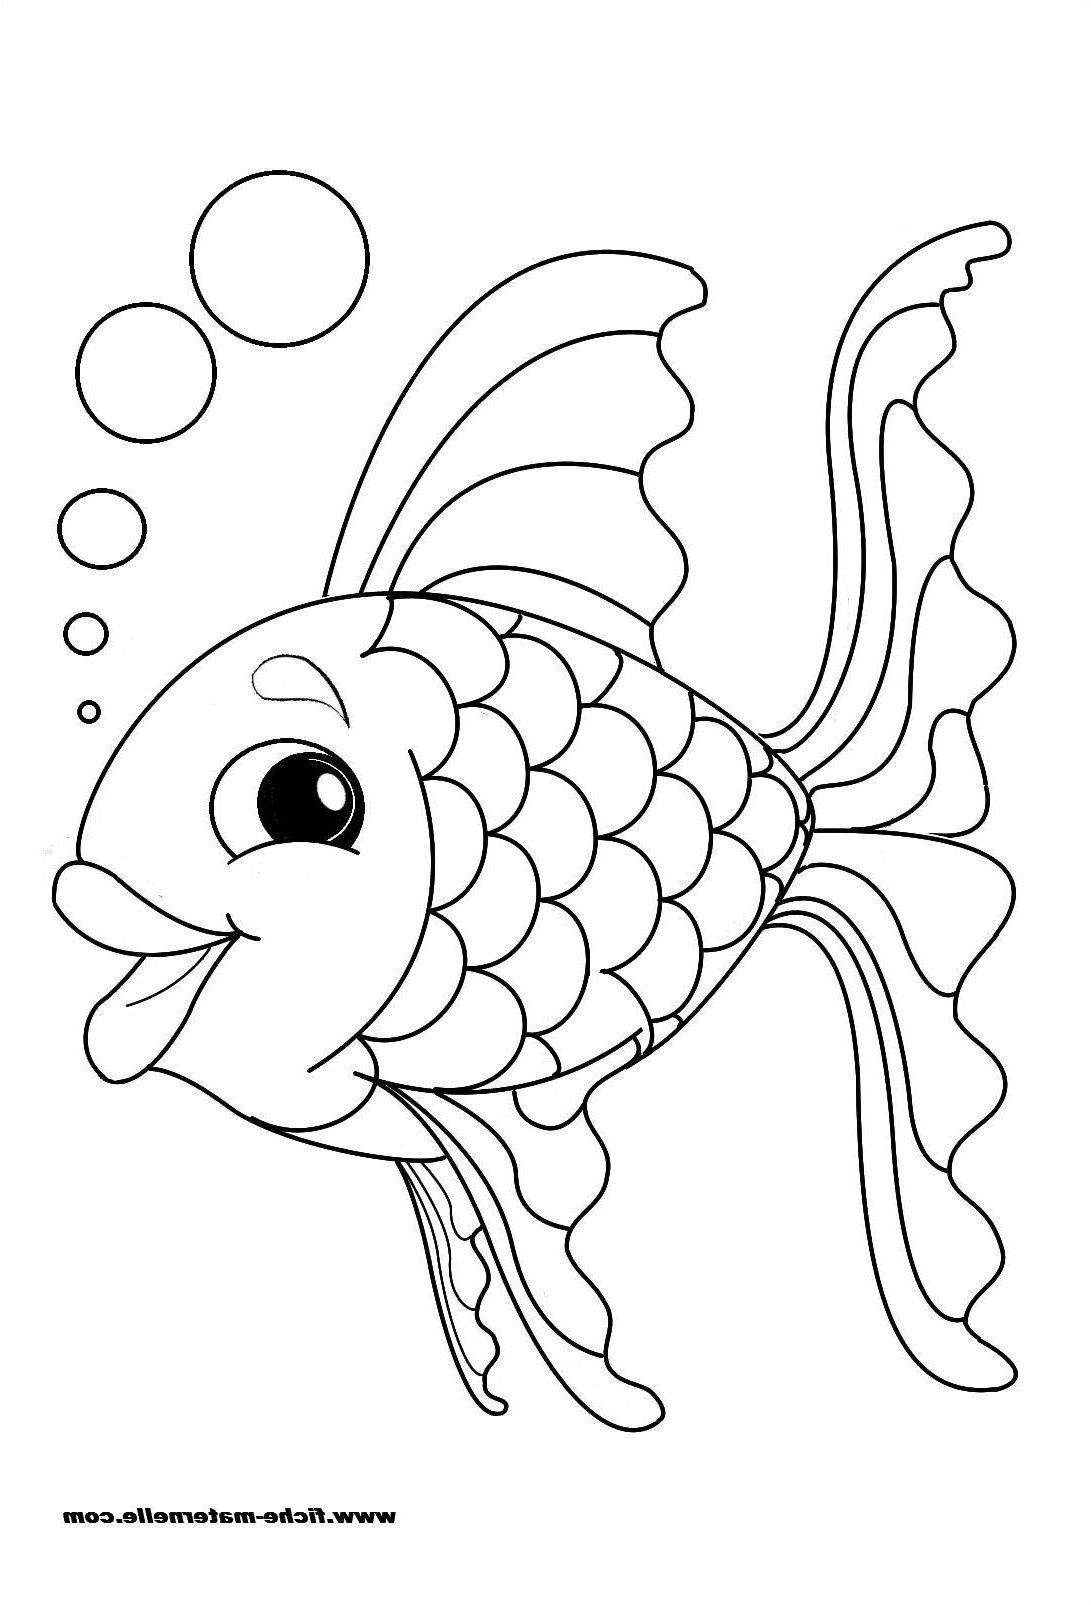 11 Divers Coloriage Poisson Facile Stock Coloriage Poisson